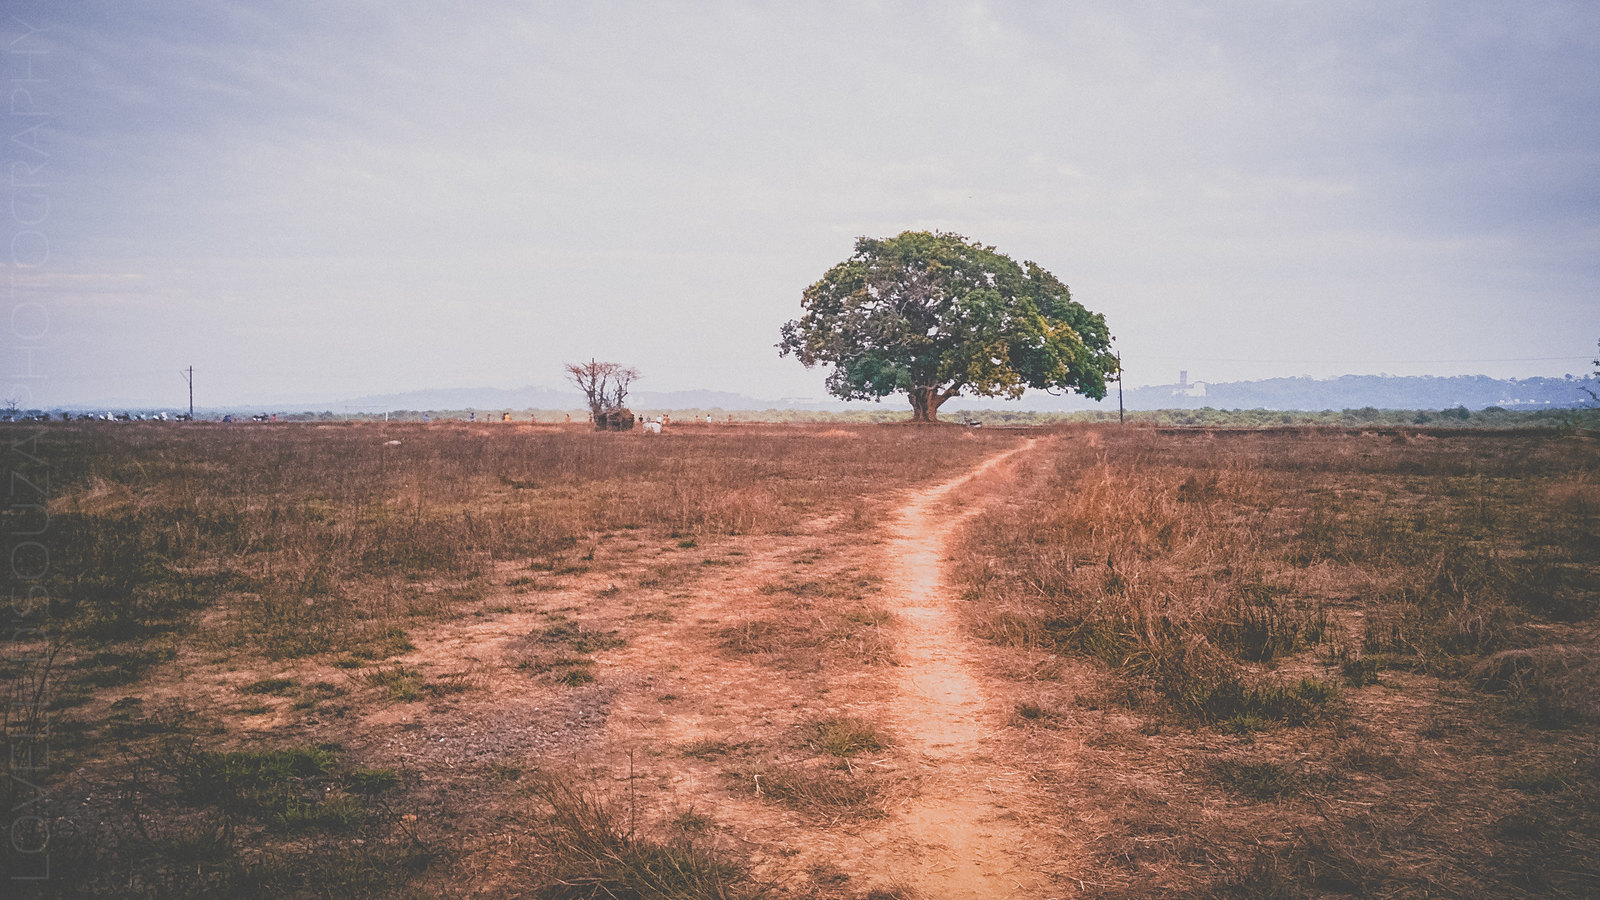 The tree along the Divar road